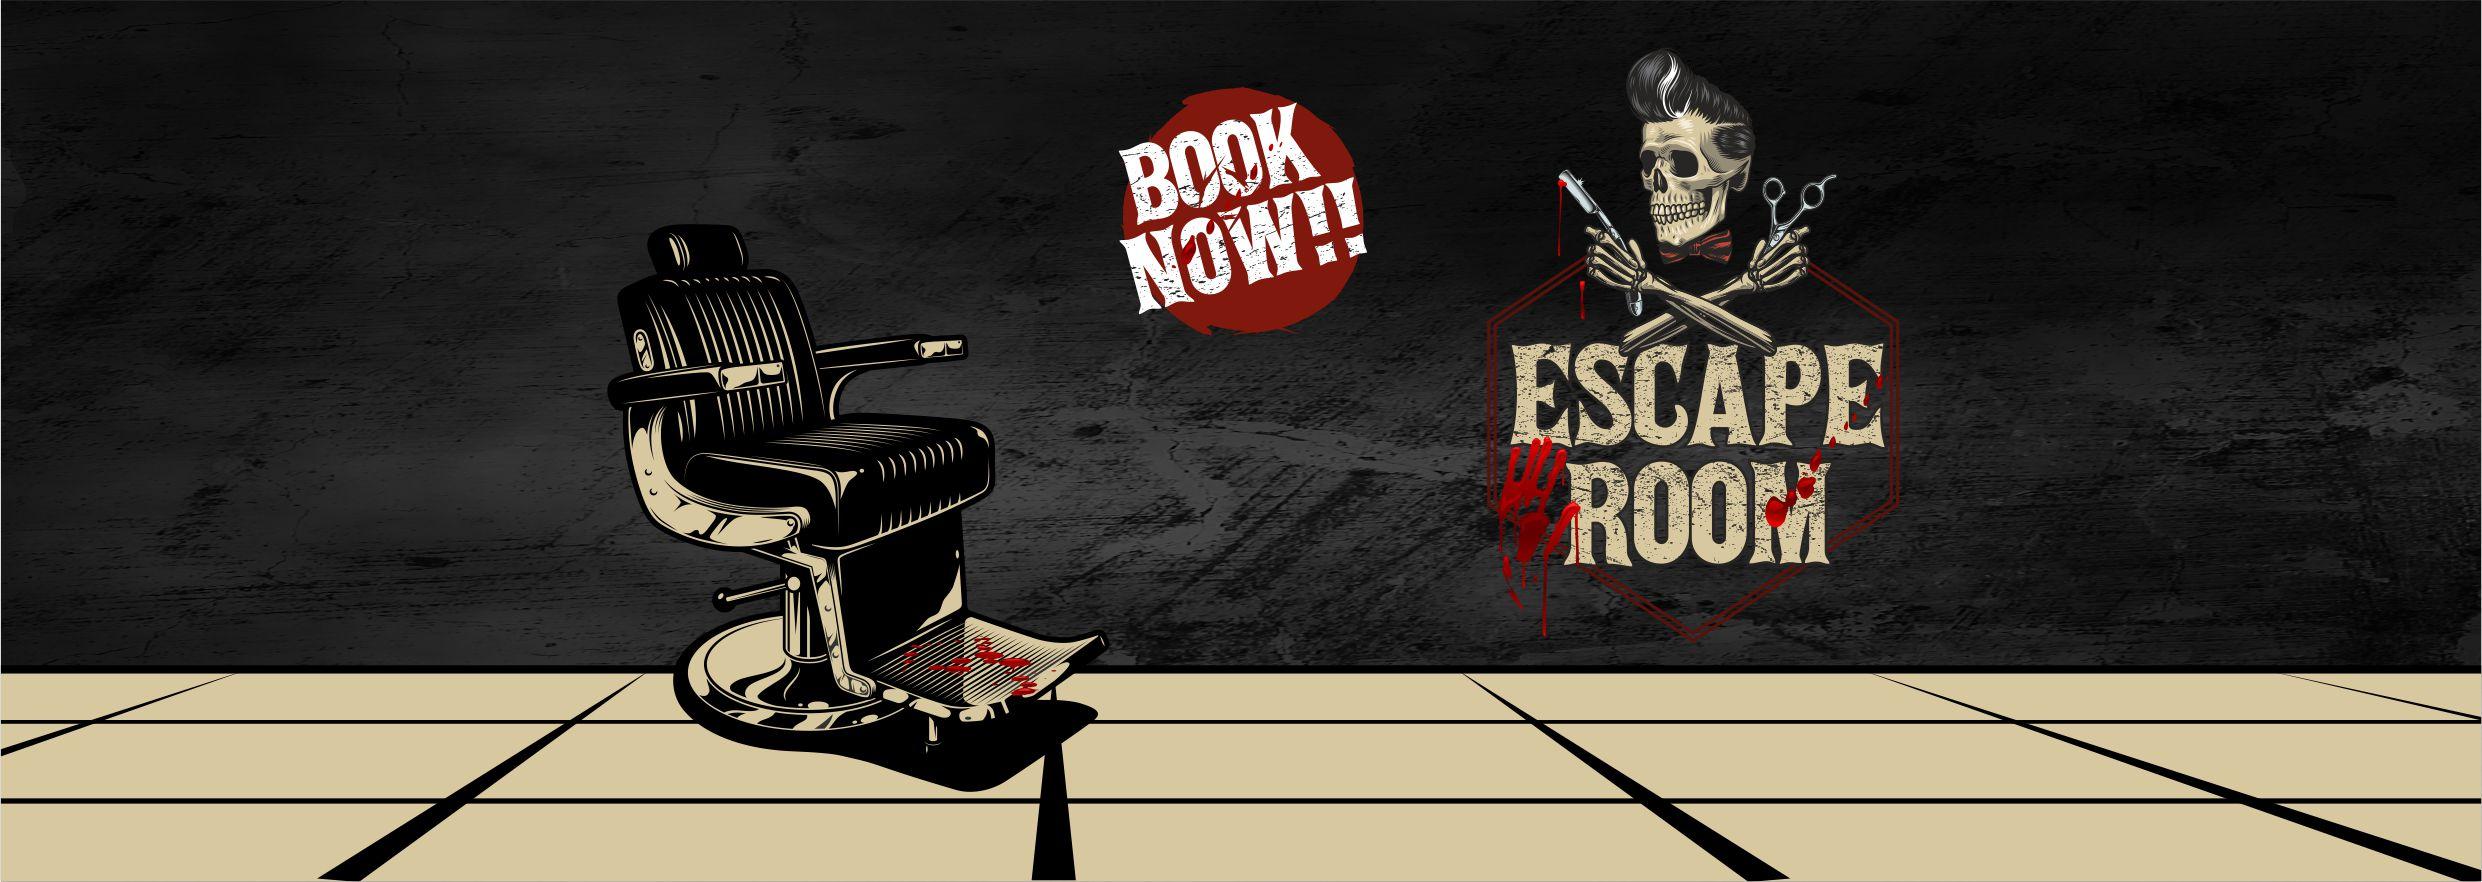 otb-sweeny-tdd-escape-room2